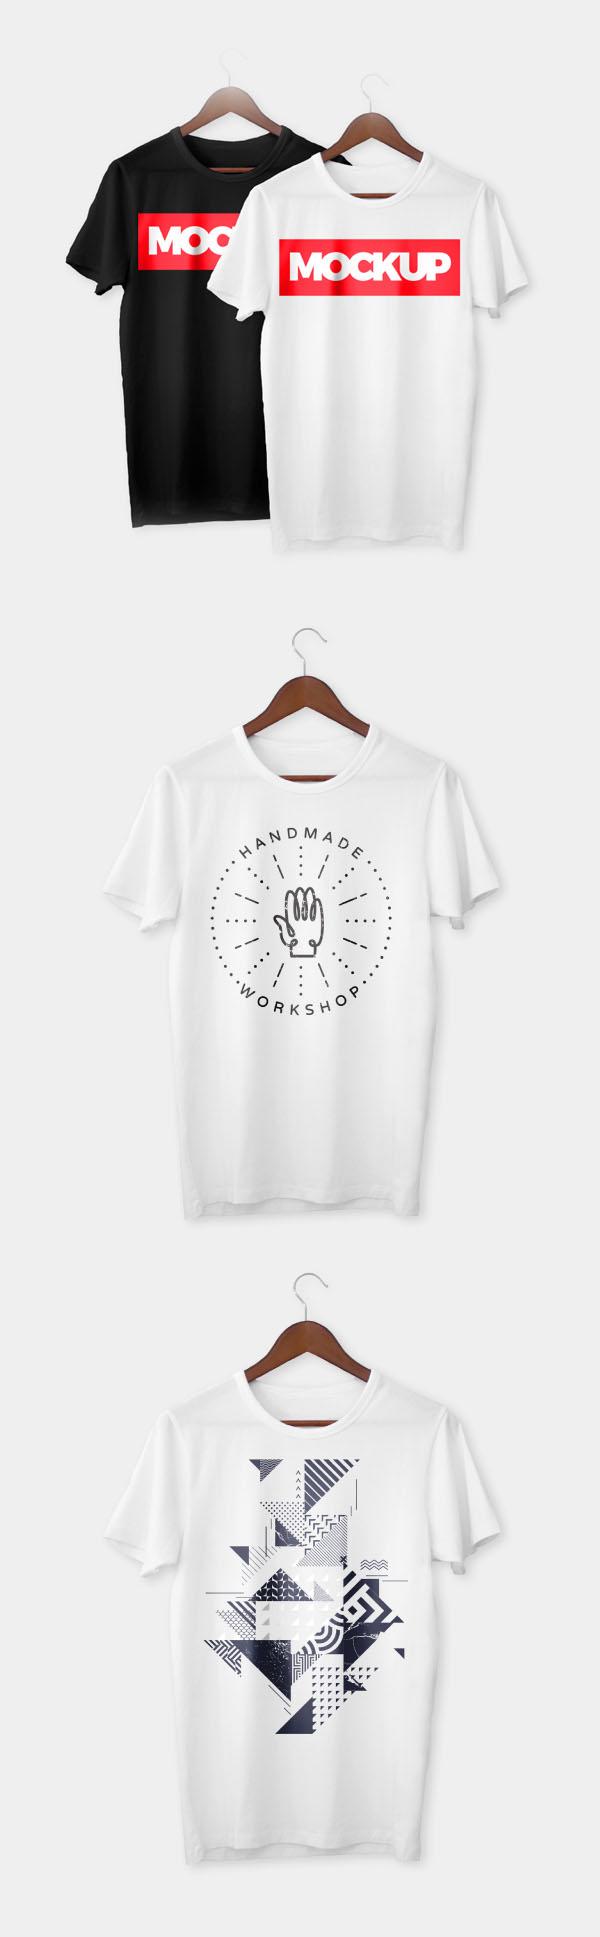 Free Realistic T-Shirt PSD Mockup Templates